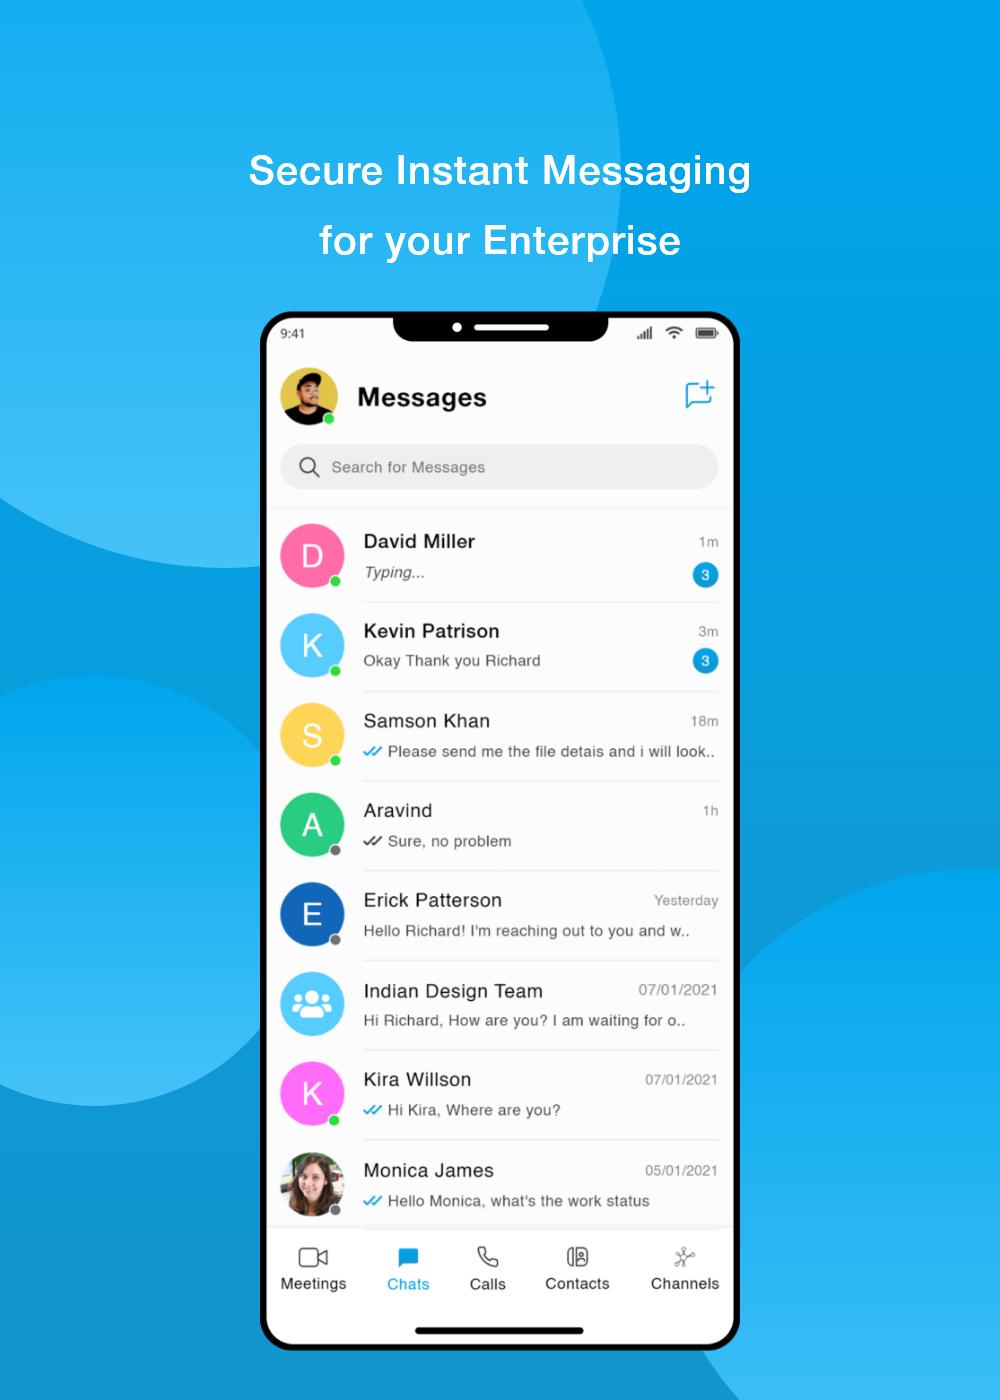 Secure Instant Messaging for your enterprise